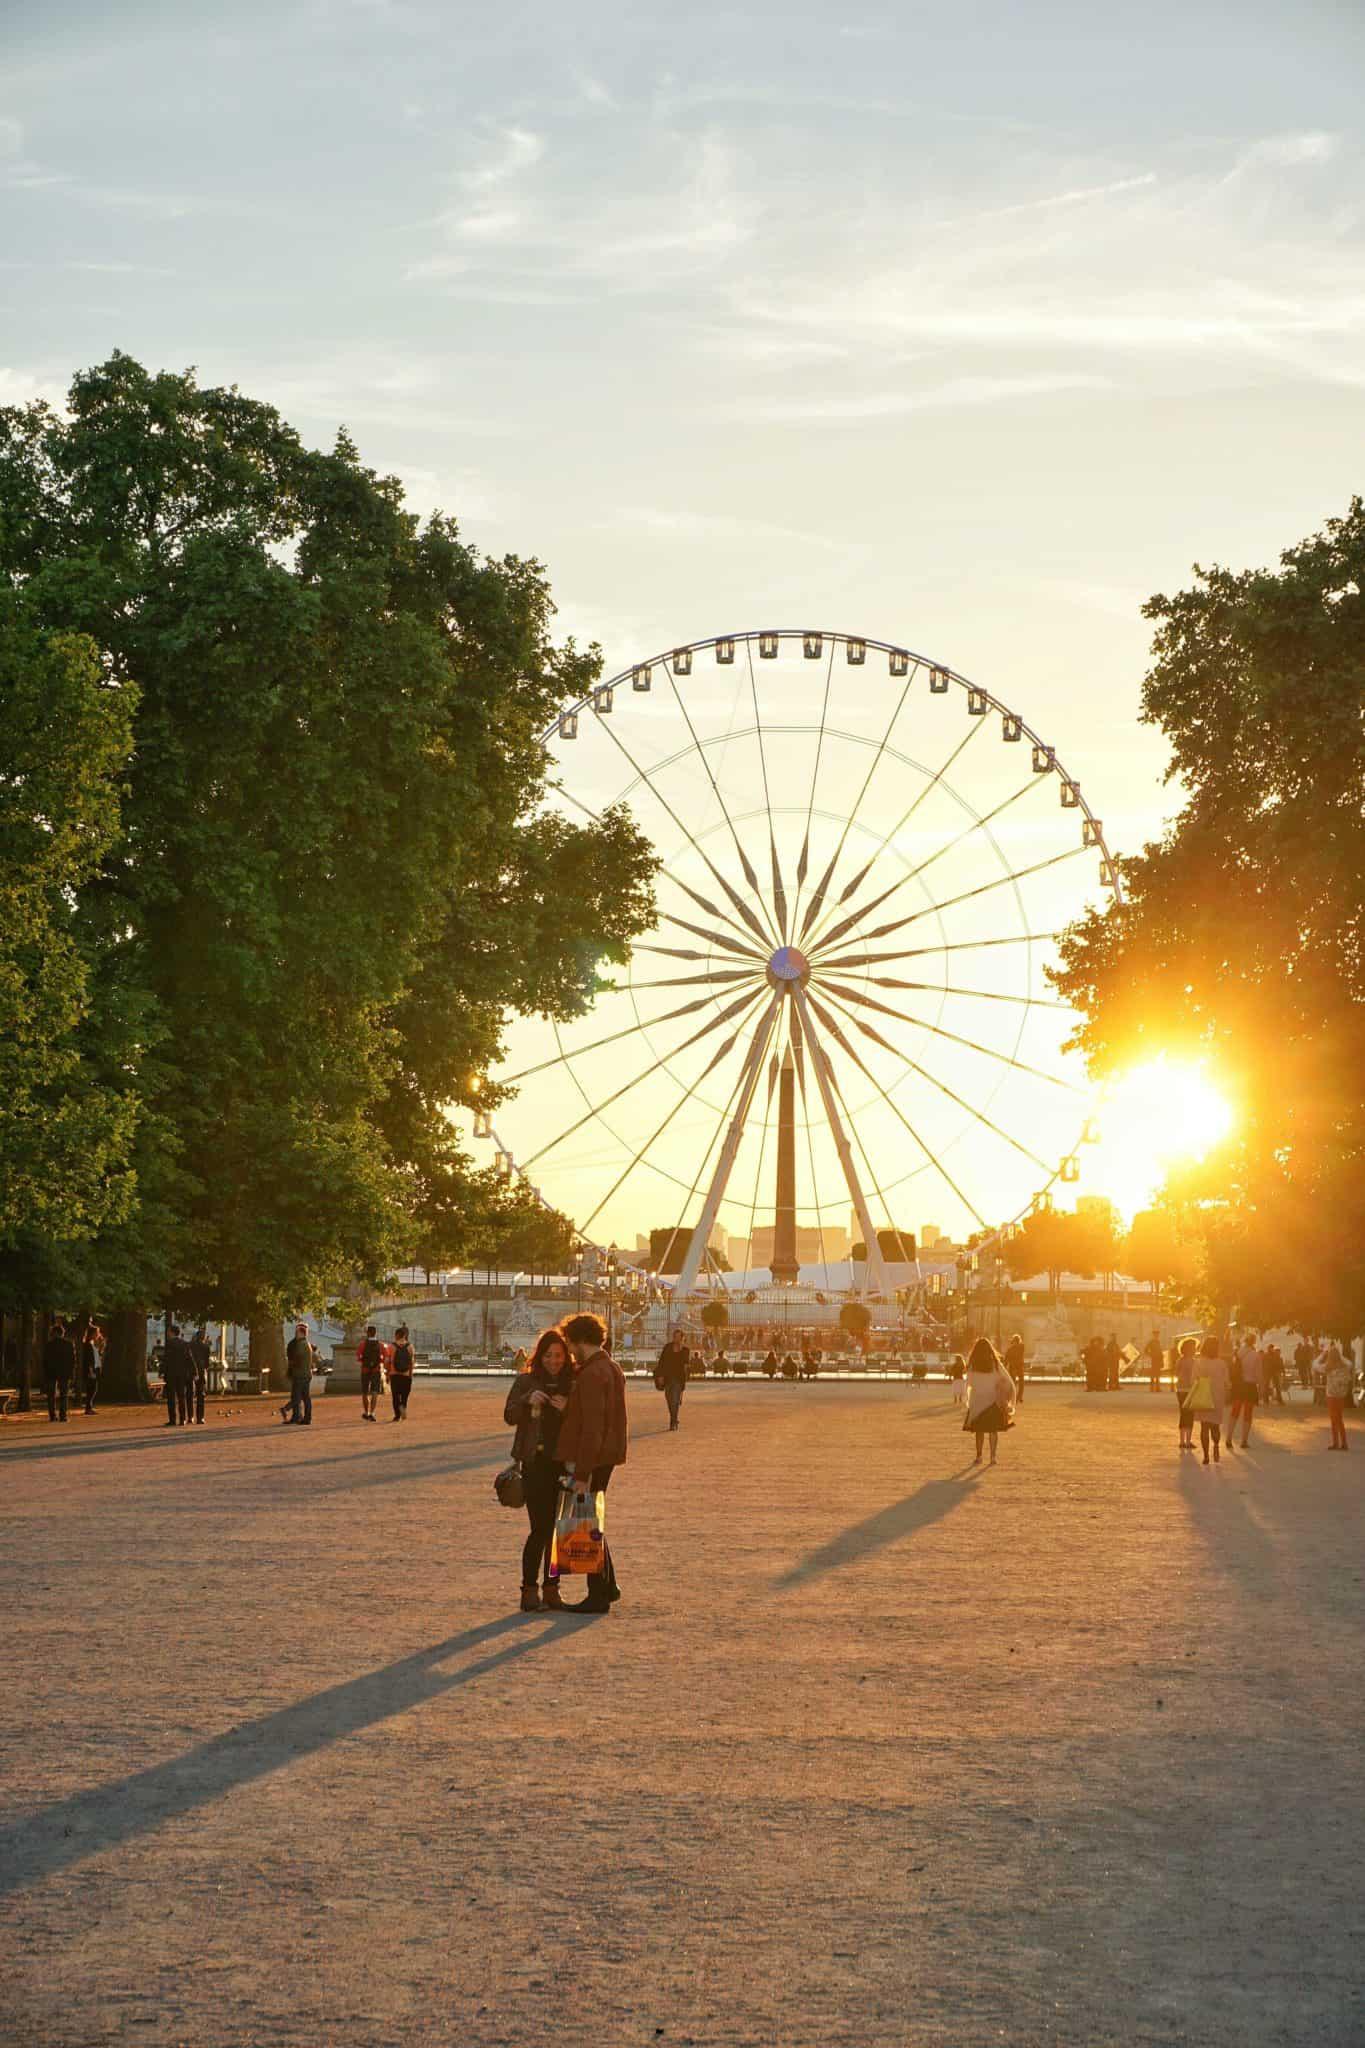 fairground in jardin des tuileries